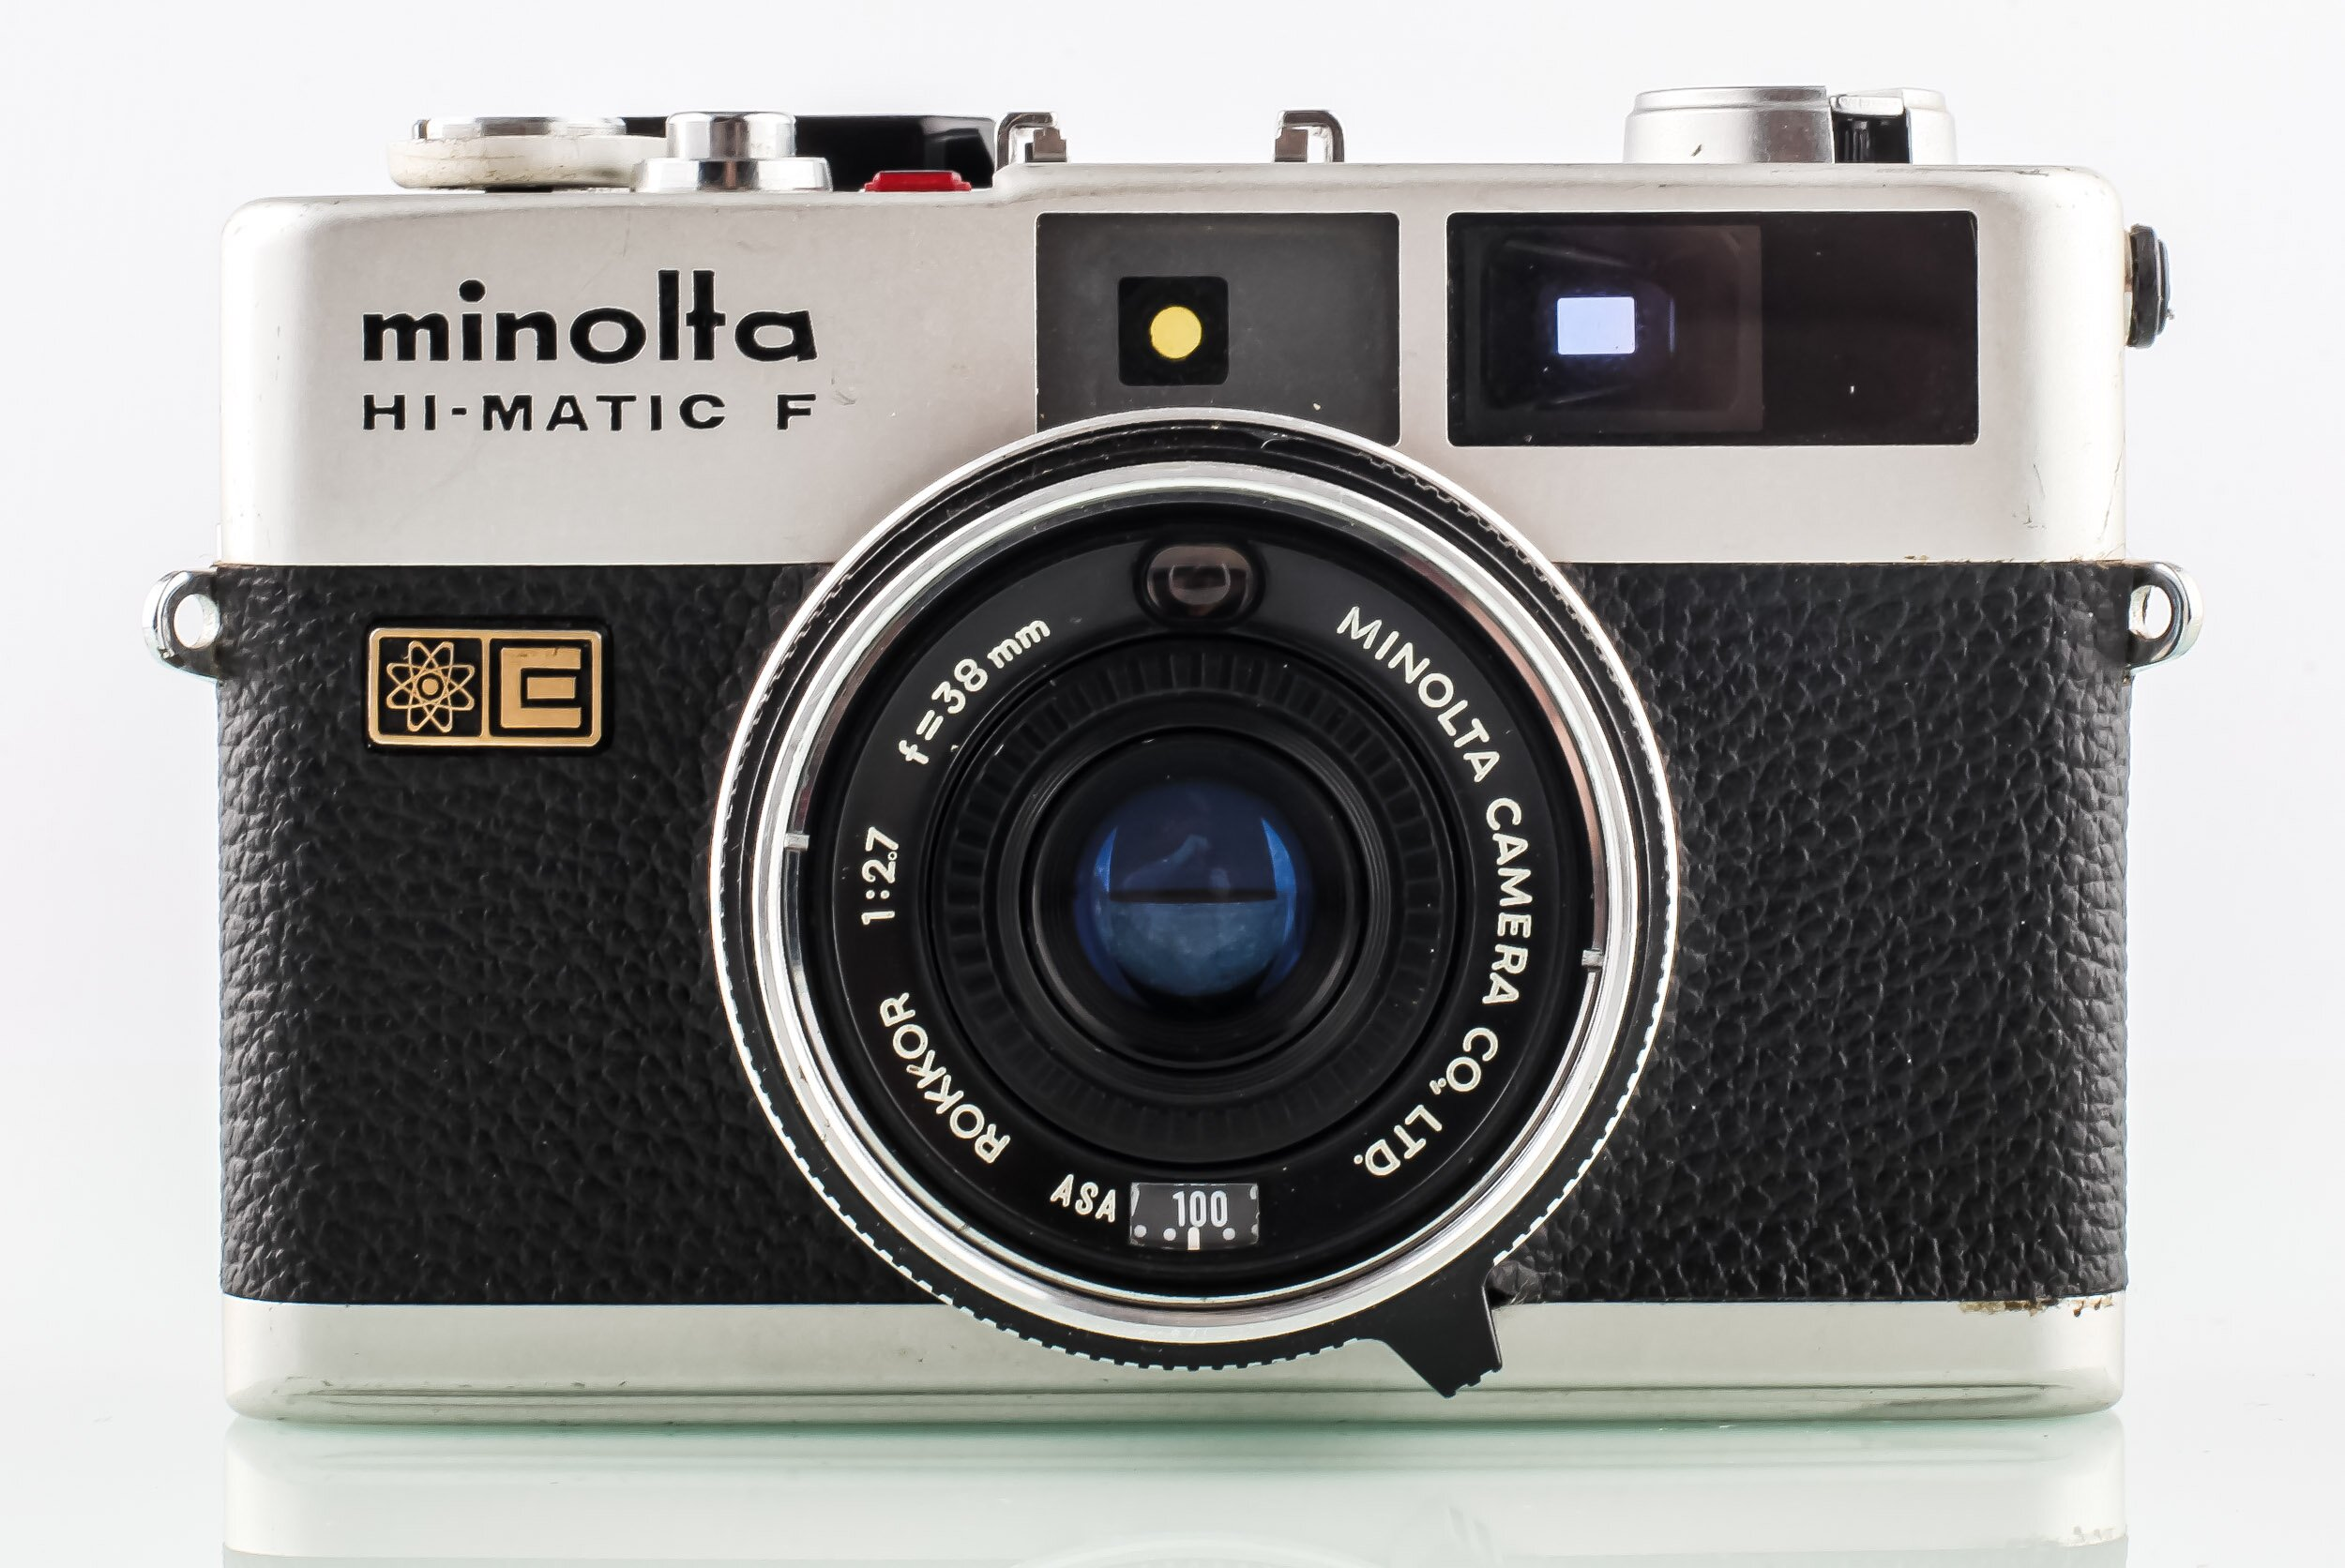 Minolta HI-Matic F Analoge Kompaktkamera